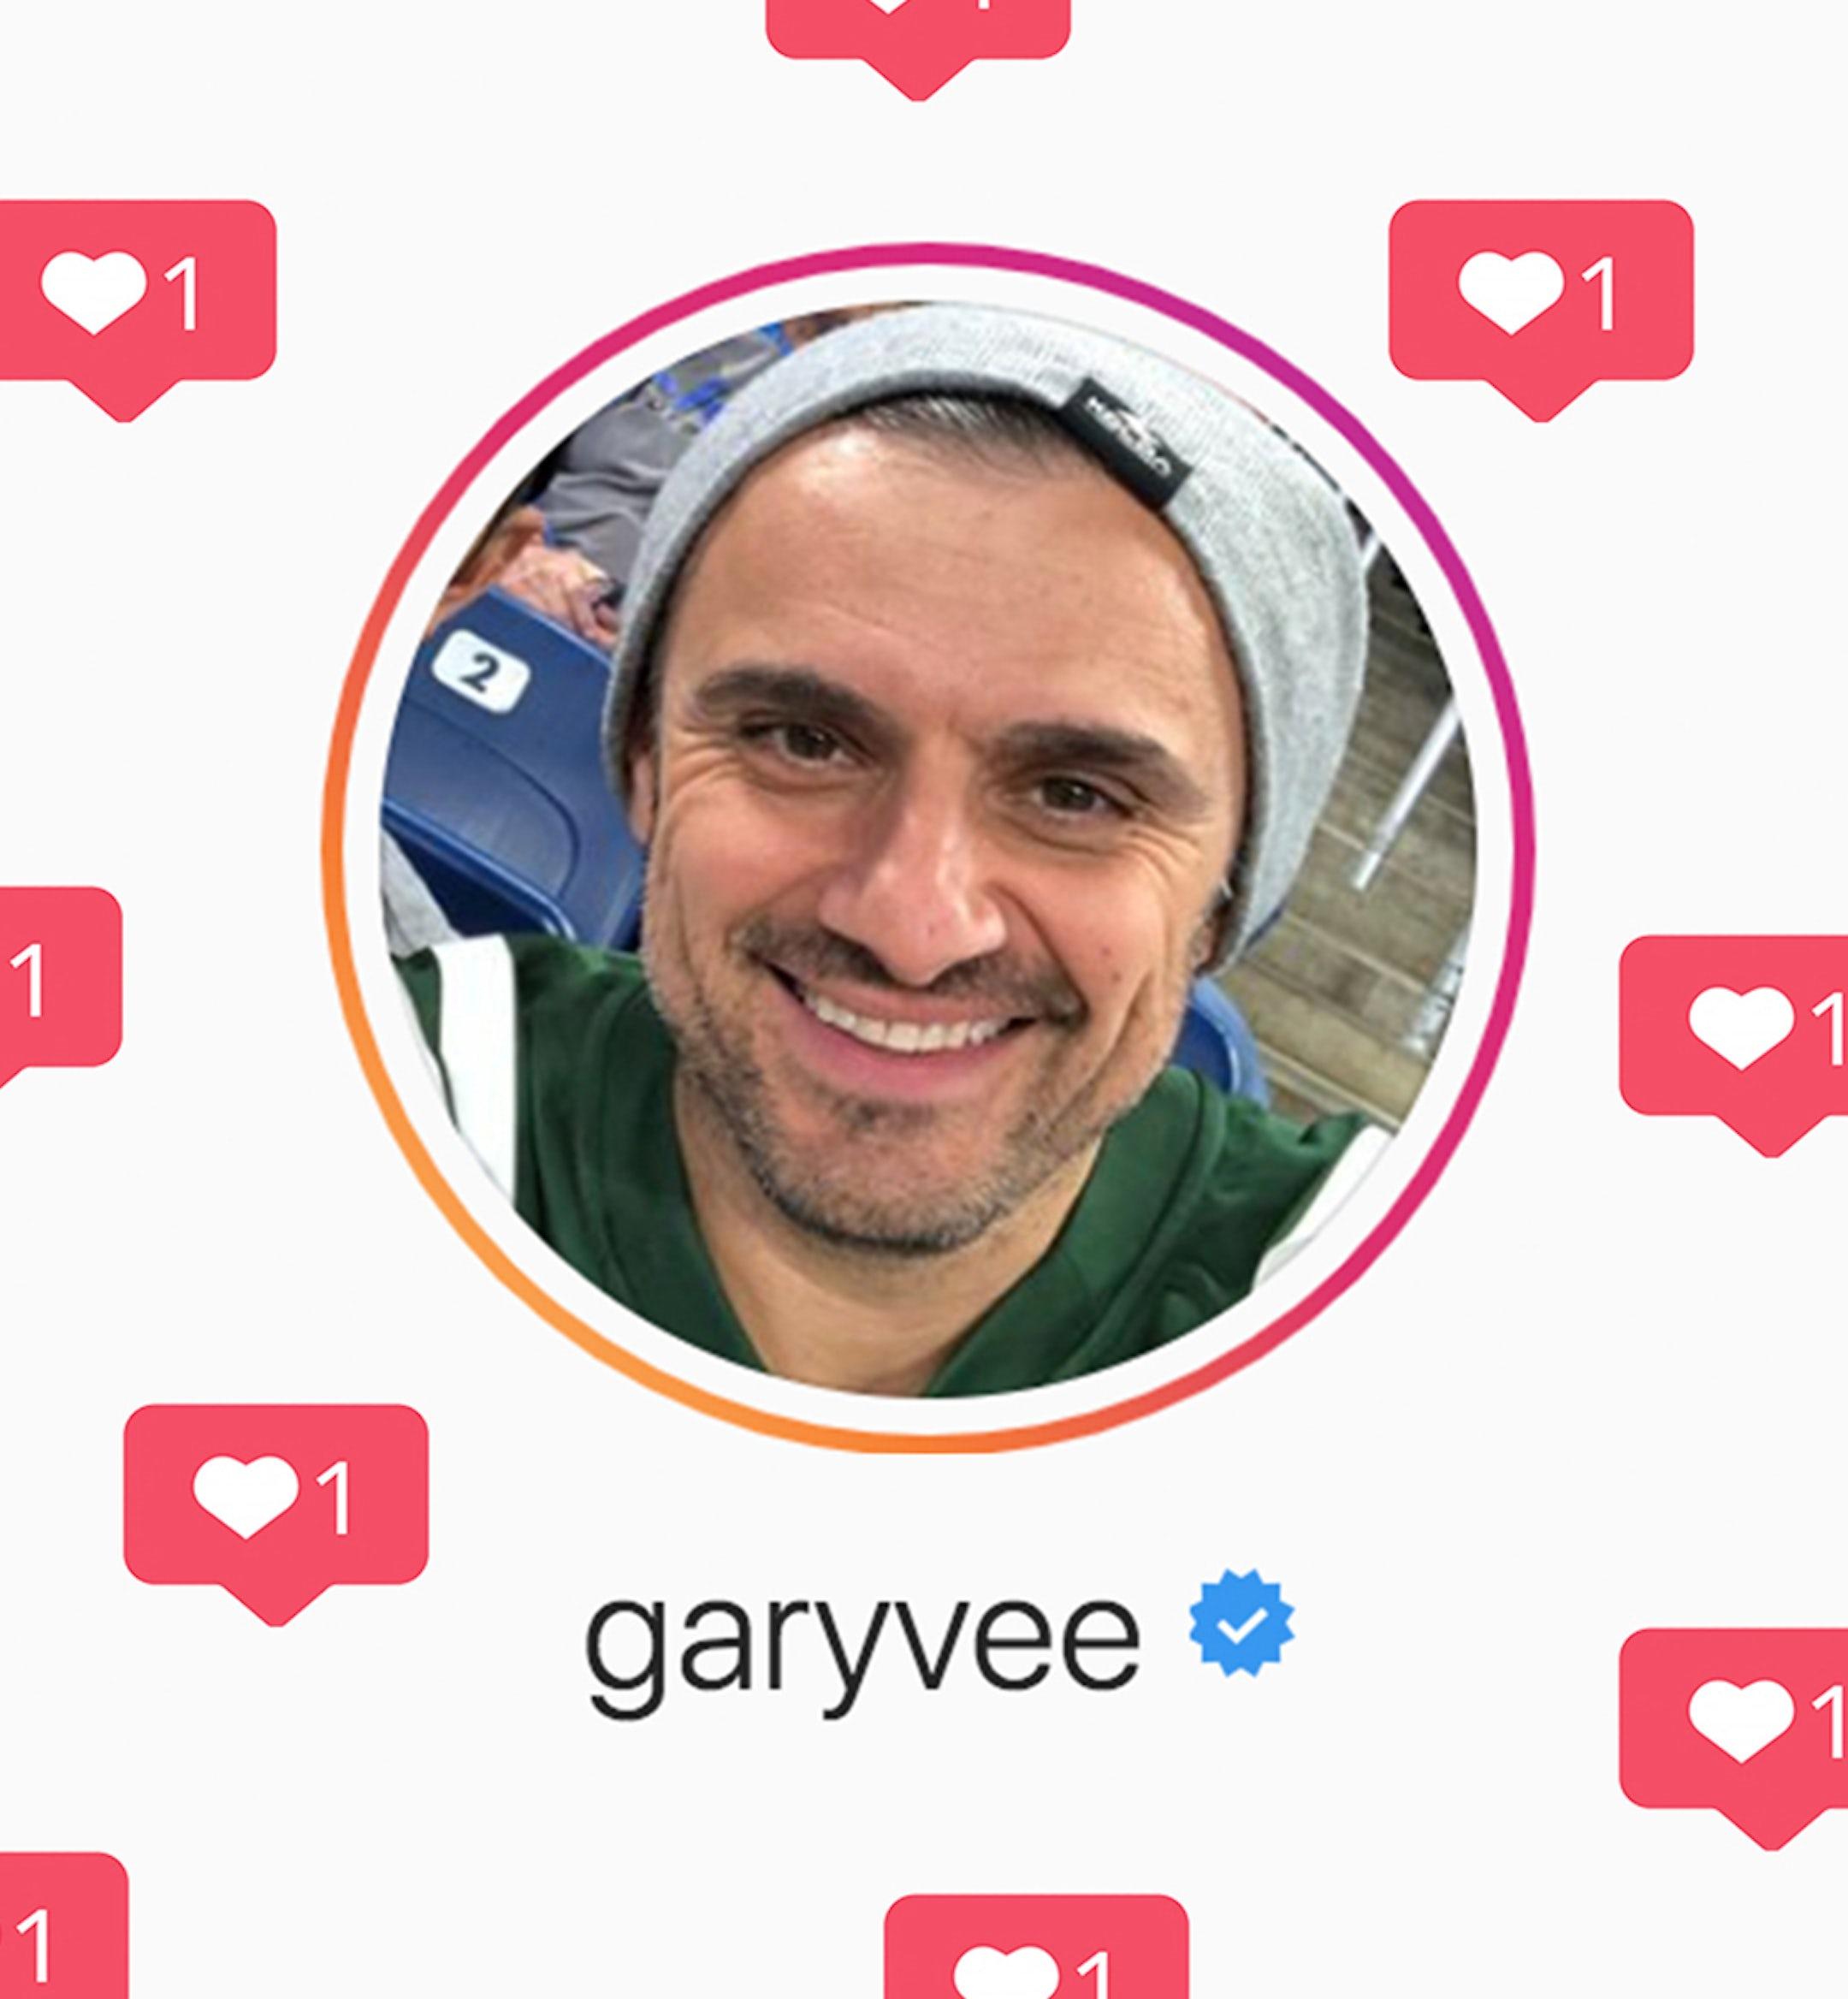 gary vee instagram stories mobile